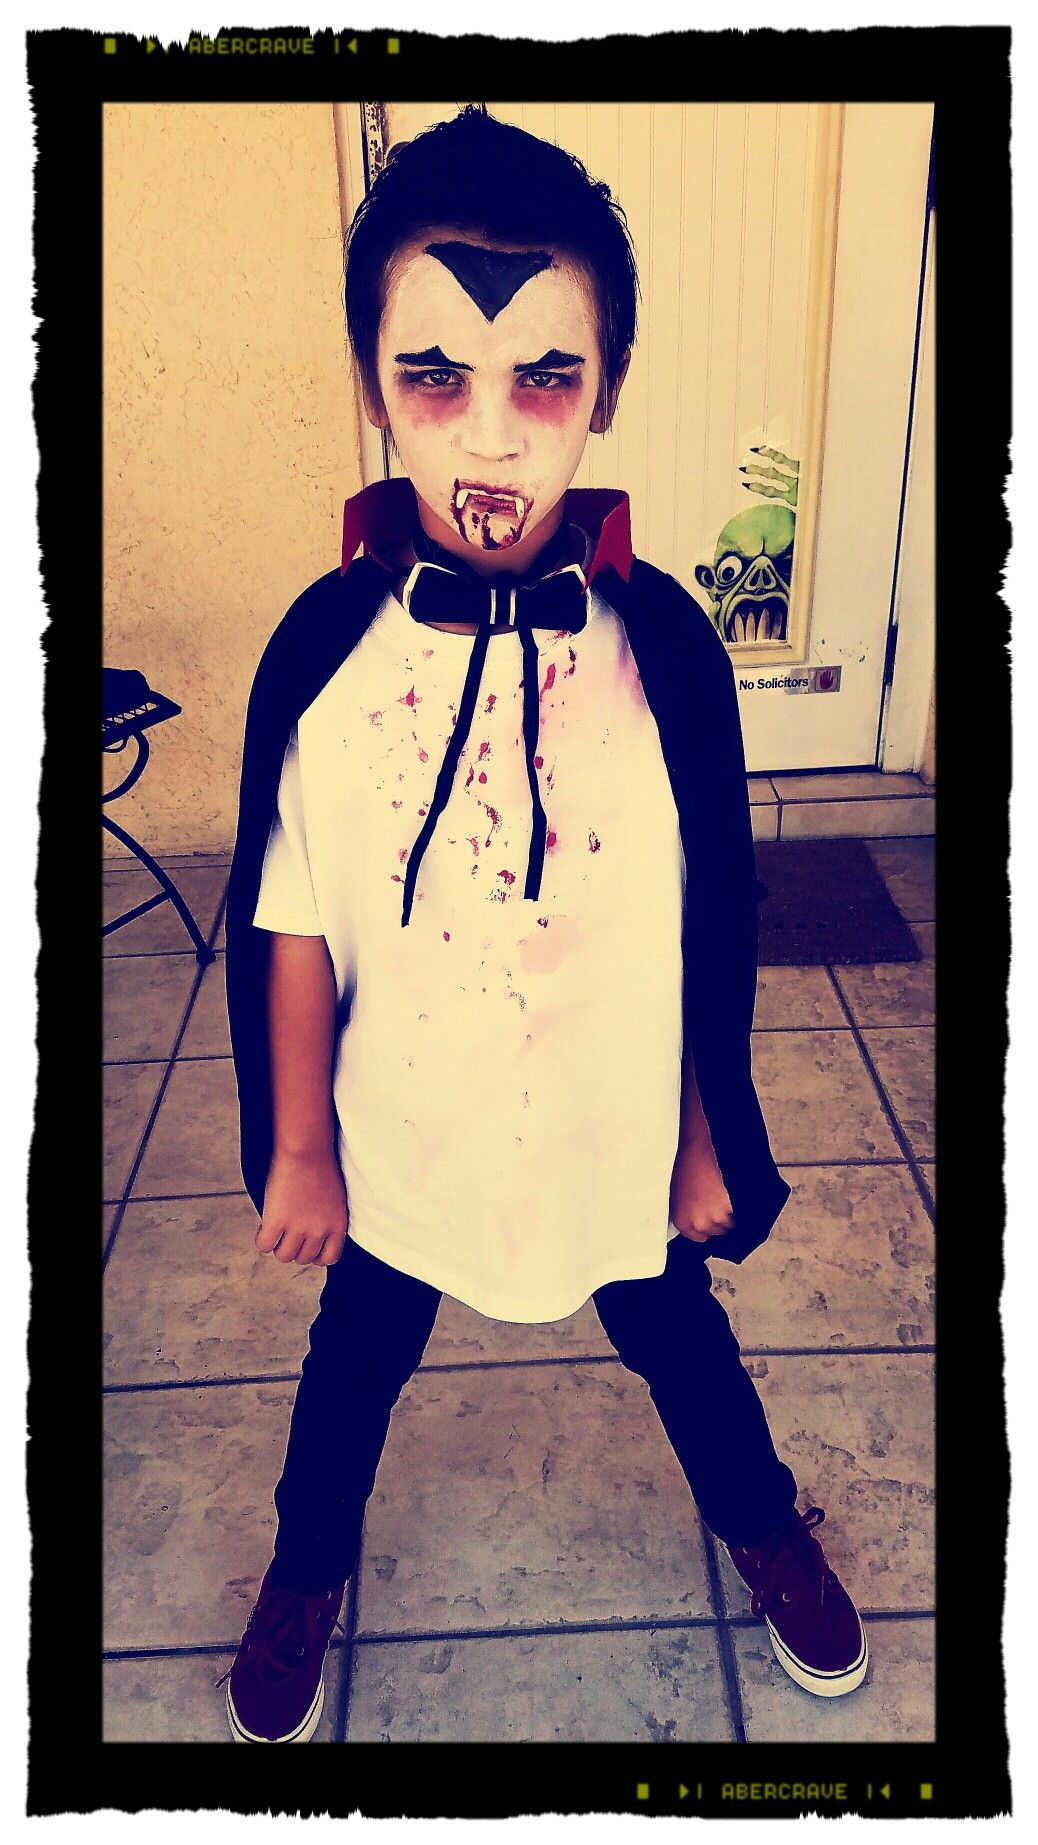 DIY Dollar Tree Dracula Halloween Costume = 5...using